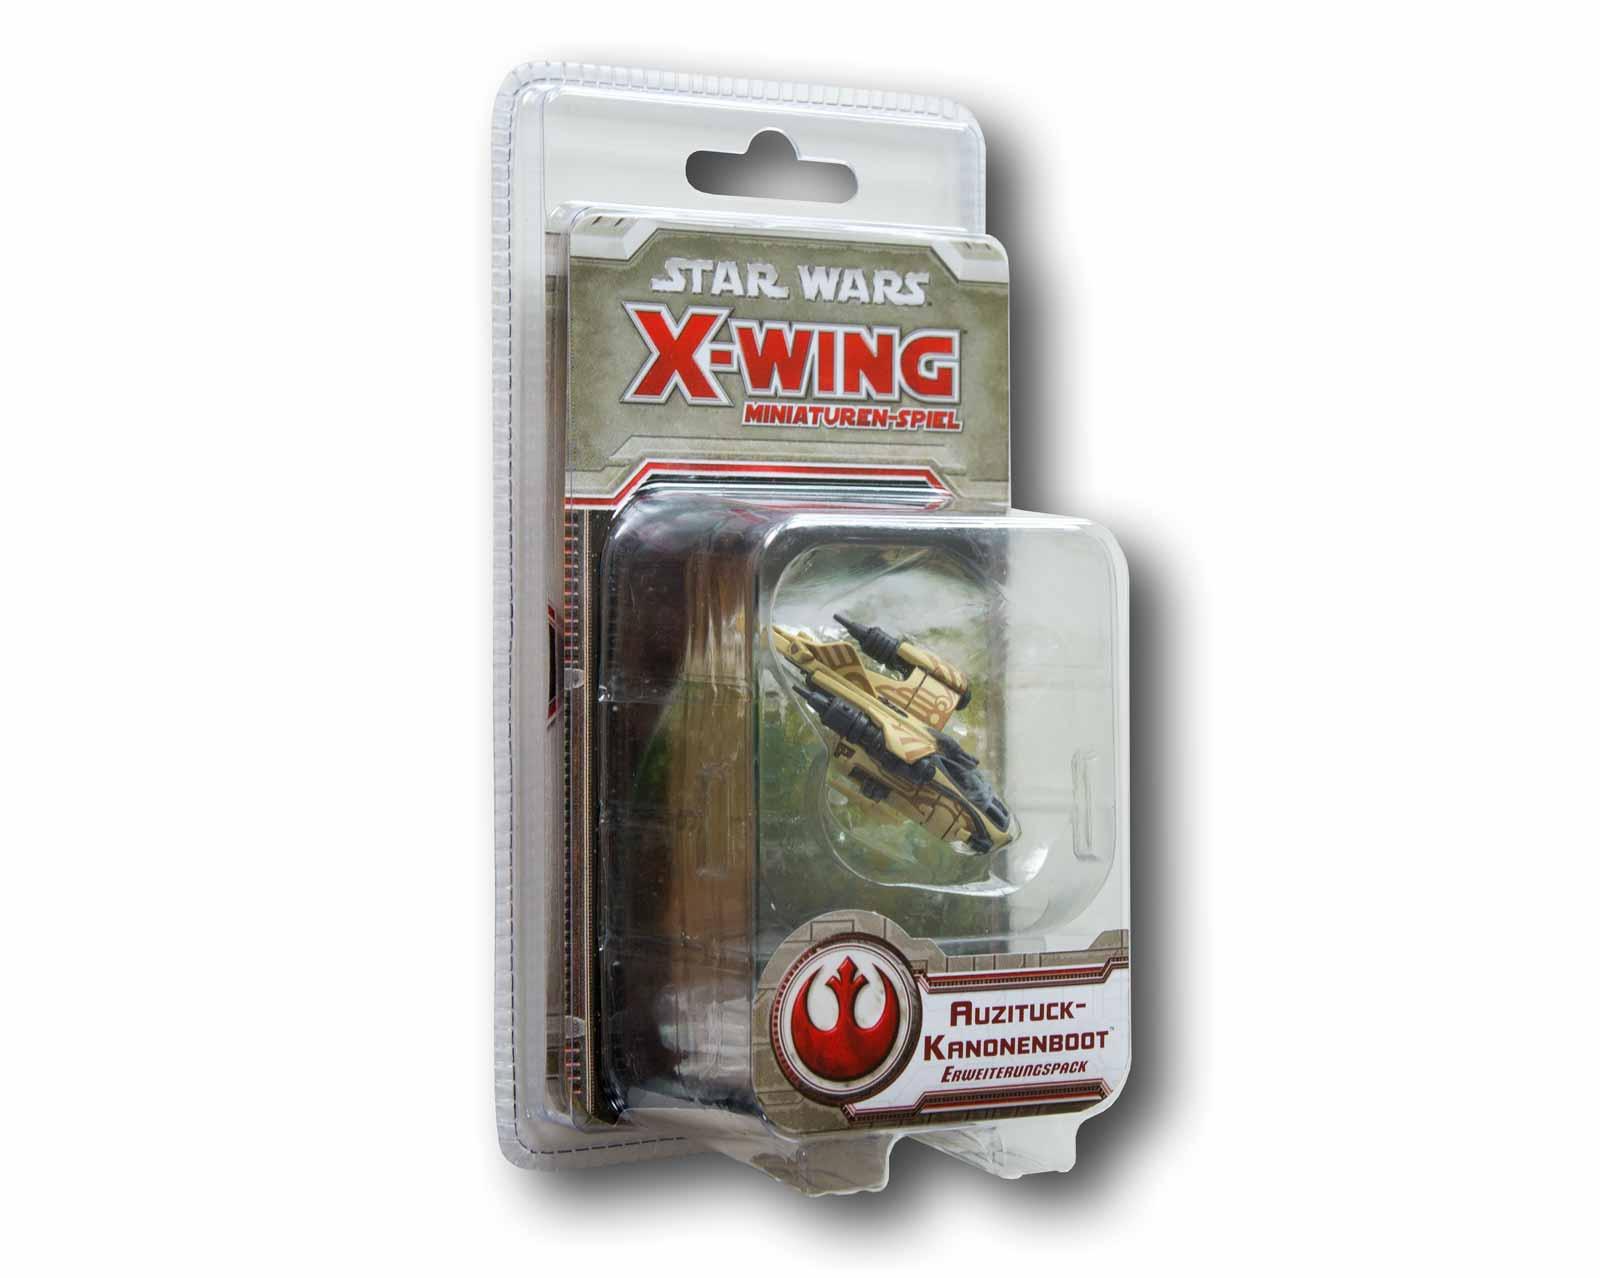 X-Wing Miniaturenspiel Auzituck Kanonenboot